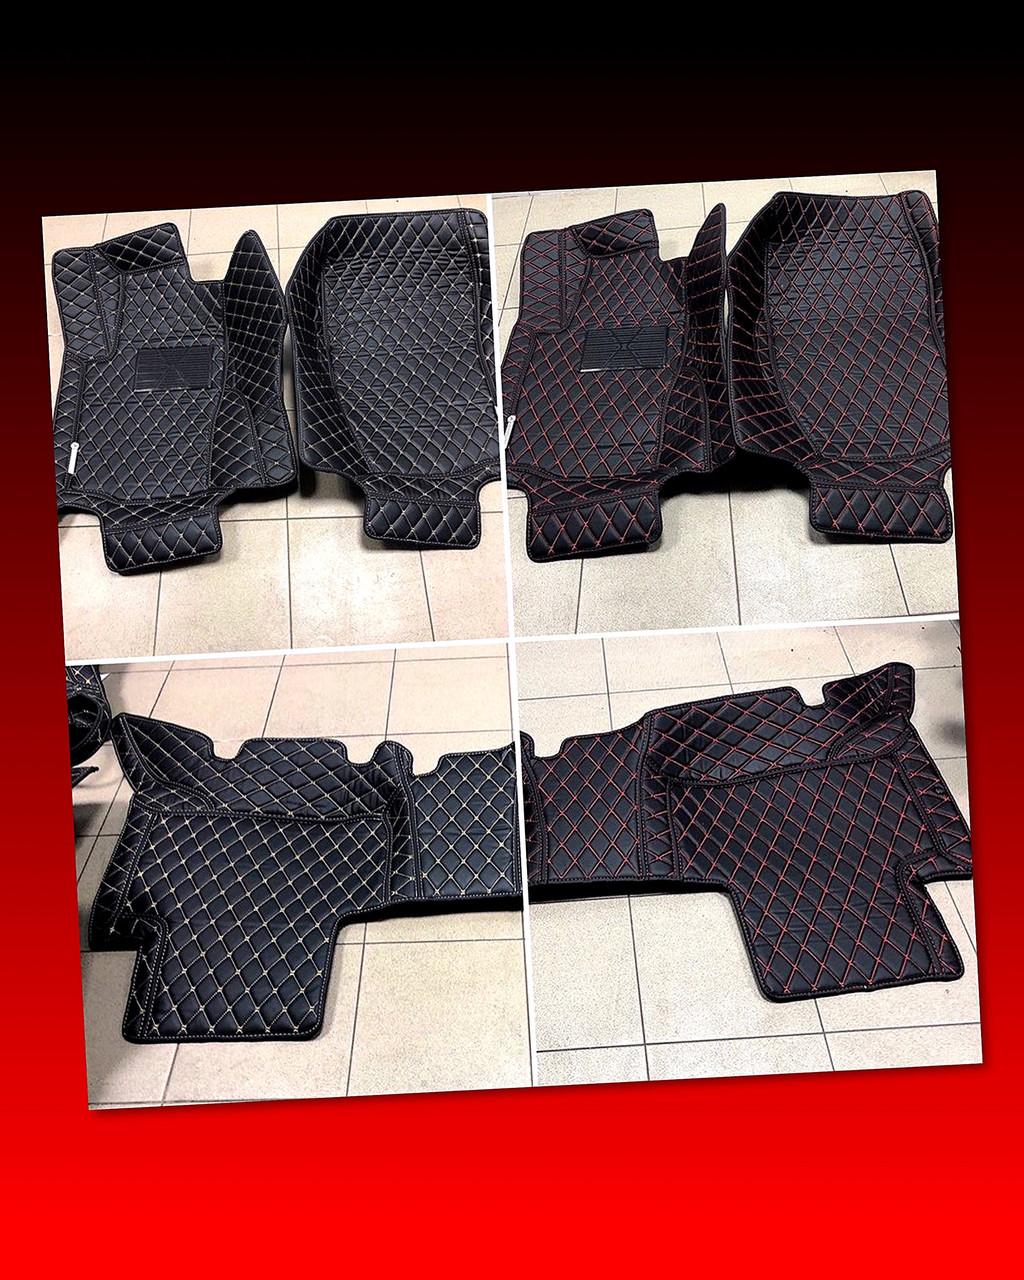 Комплект ковриков из экокожи для Mercedes ML W166, W164